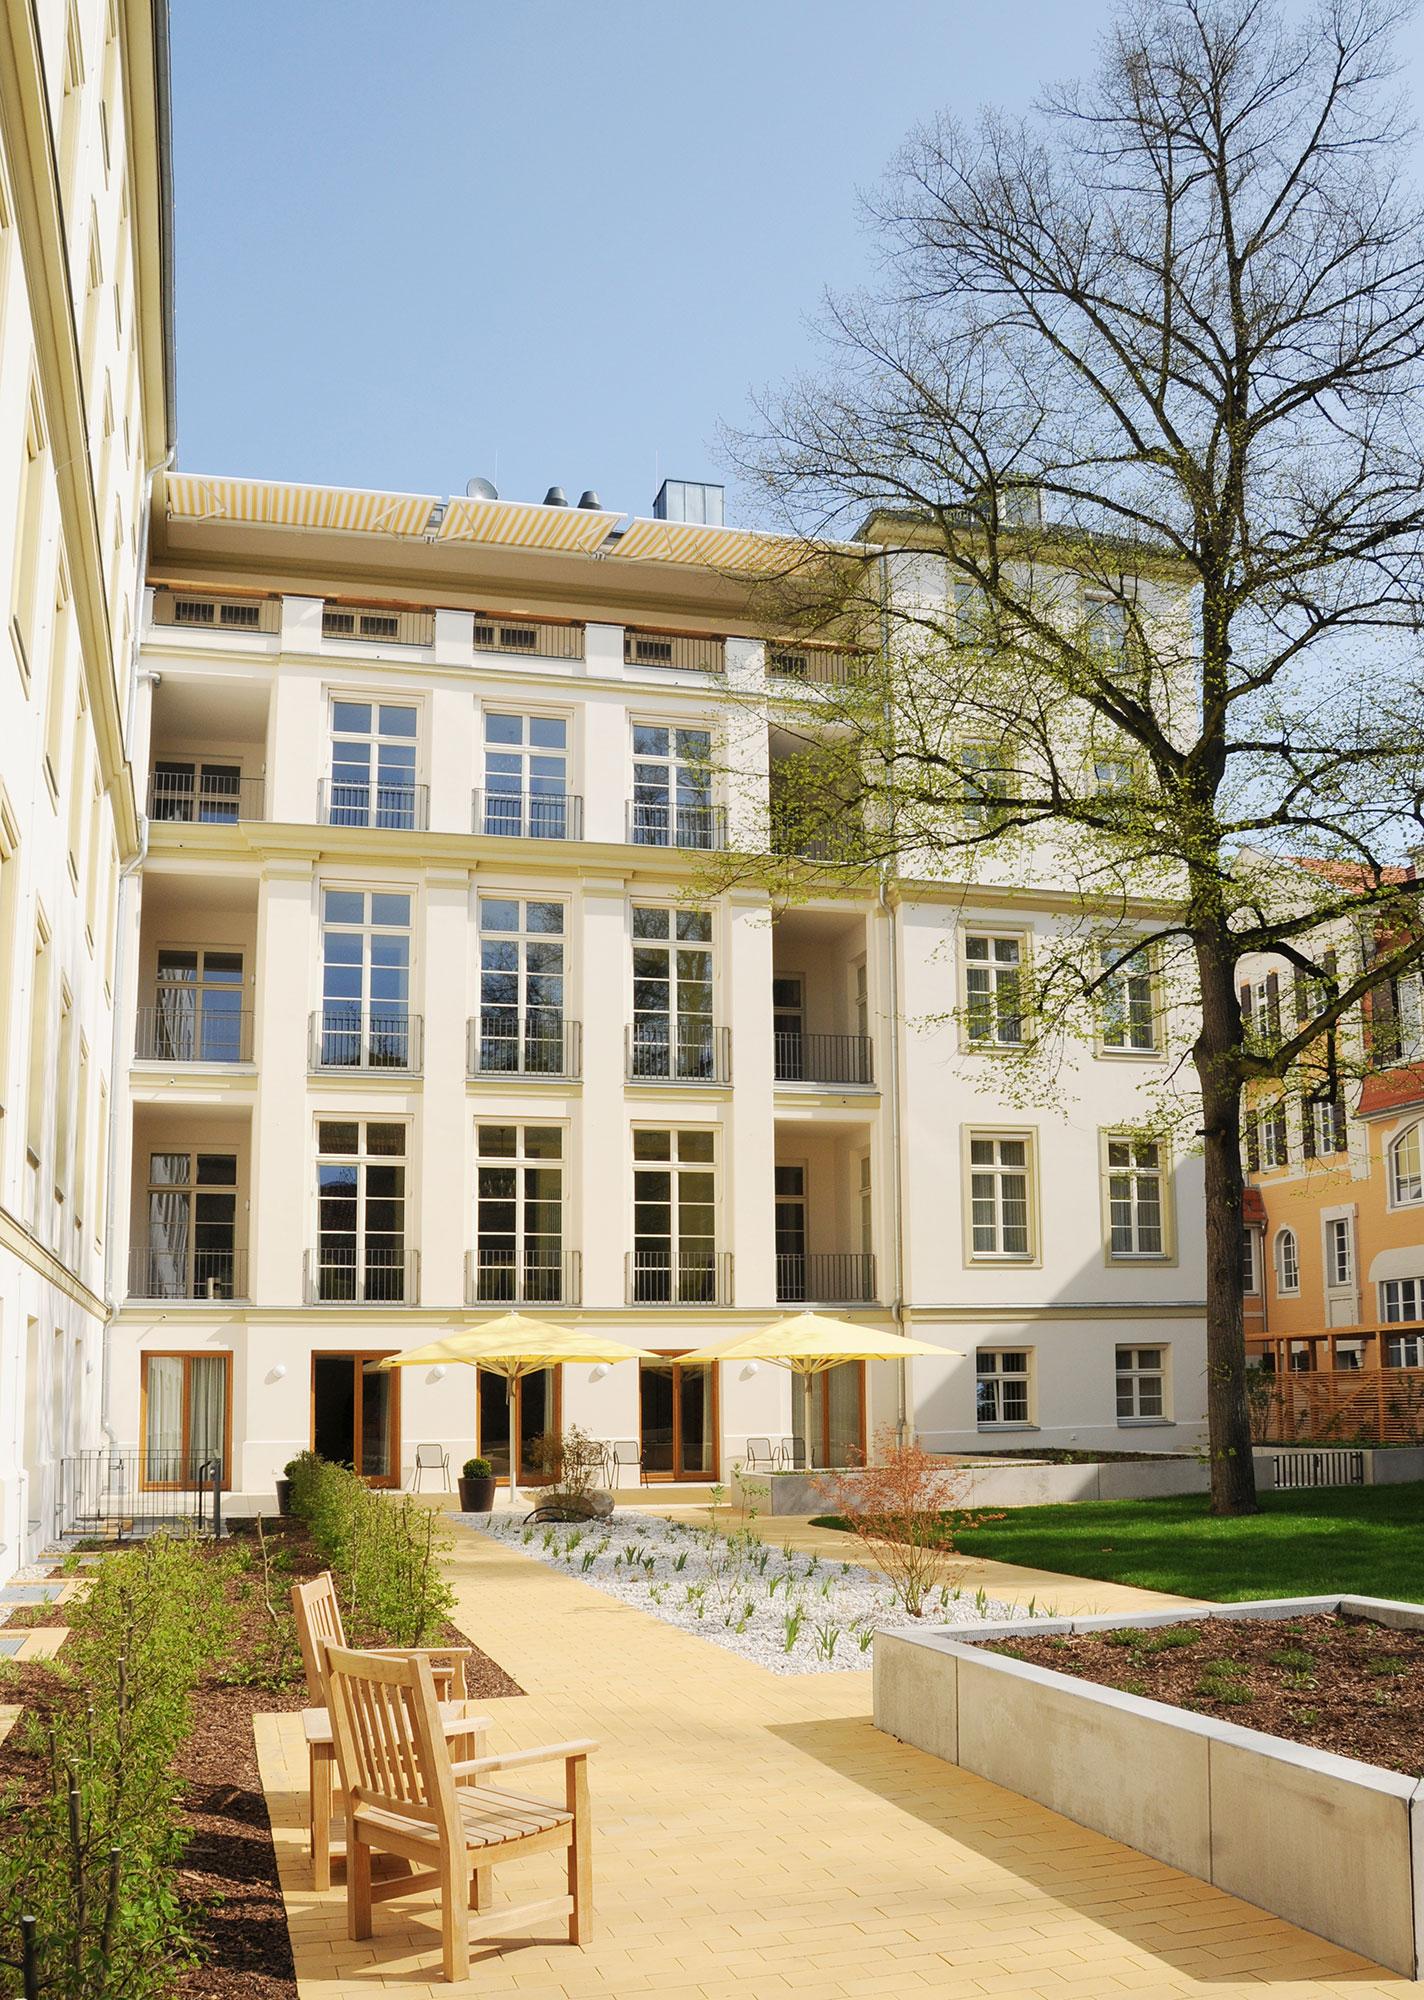 nova vita seniorenresidenzen Berlin